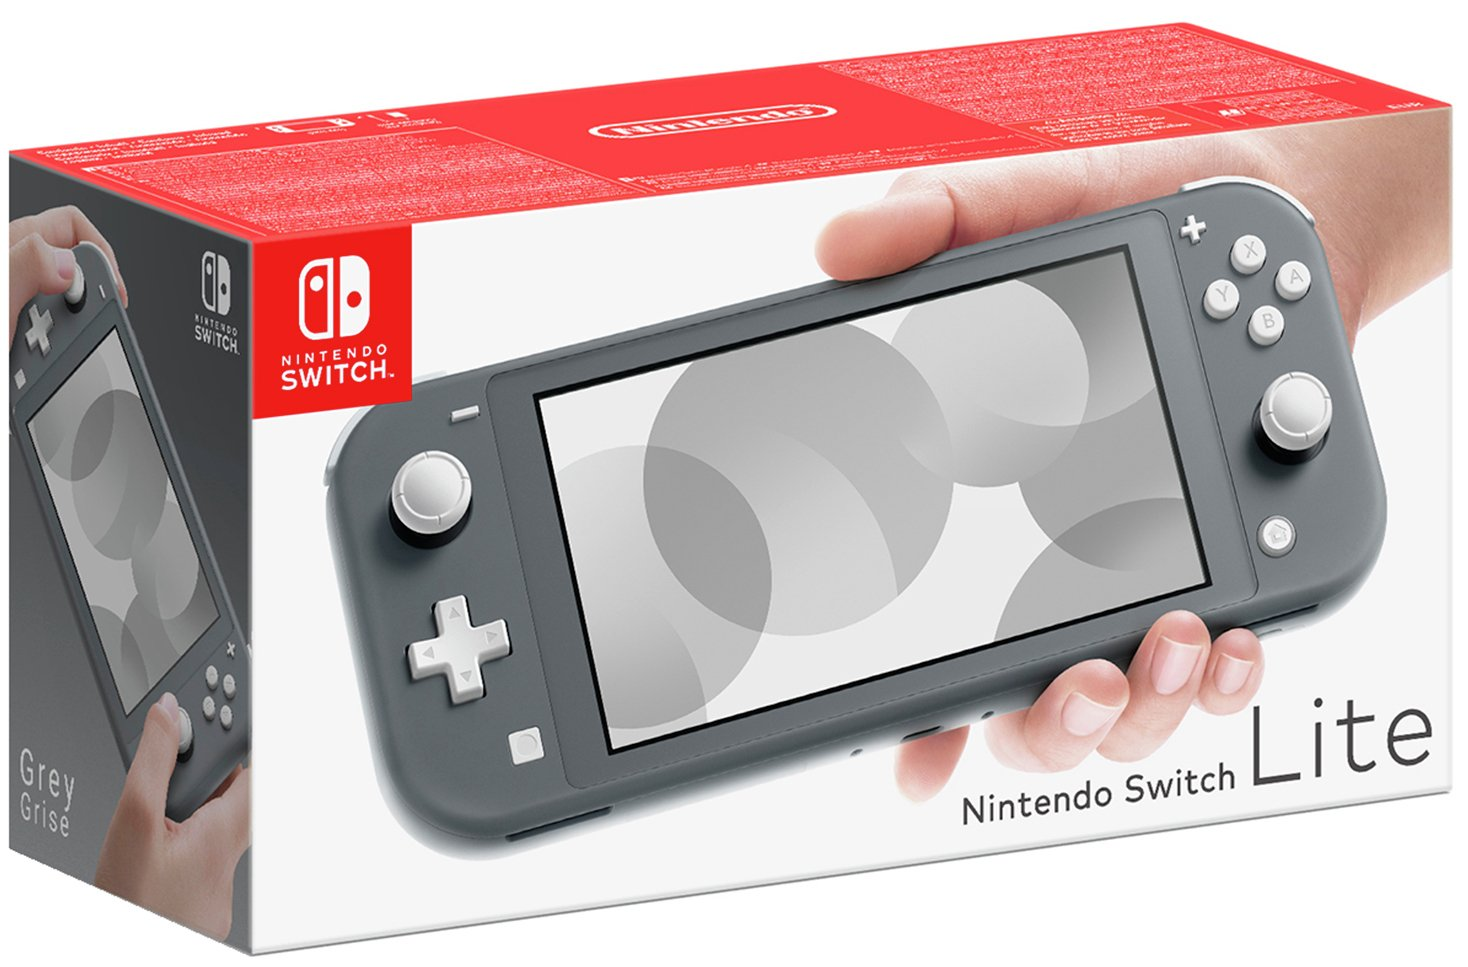 Nintendo Switch Lite Handheld Console - Grey